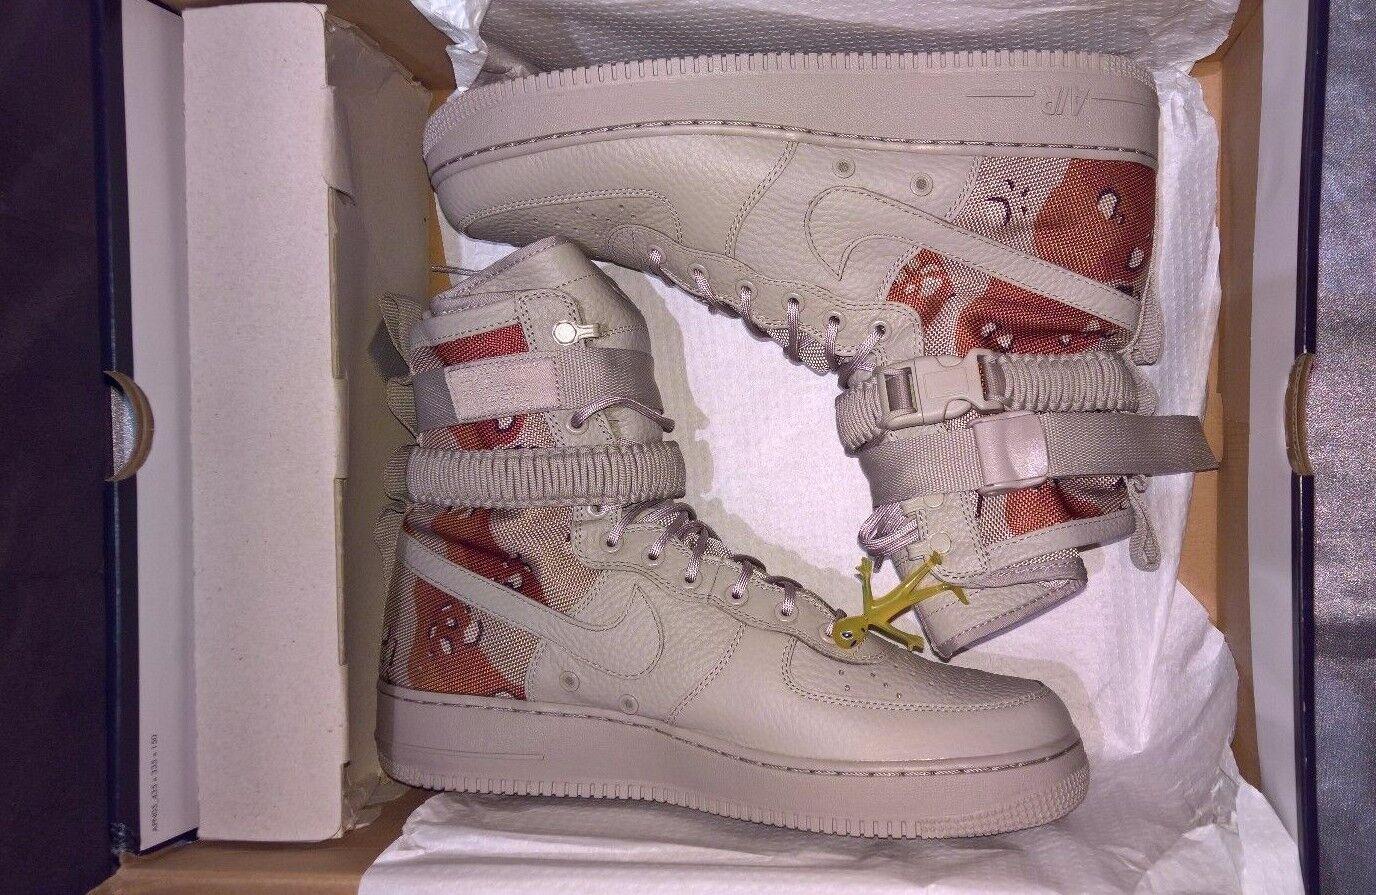 Nike Special Forces Air Force 1 Desert Camo Men's Sz 13 864024-202 BNIB Cheap and beautiful fashion